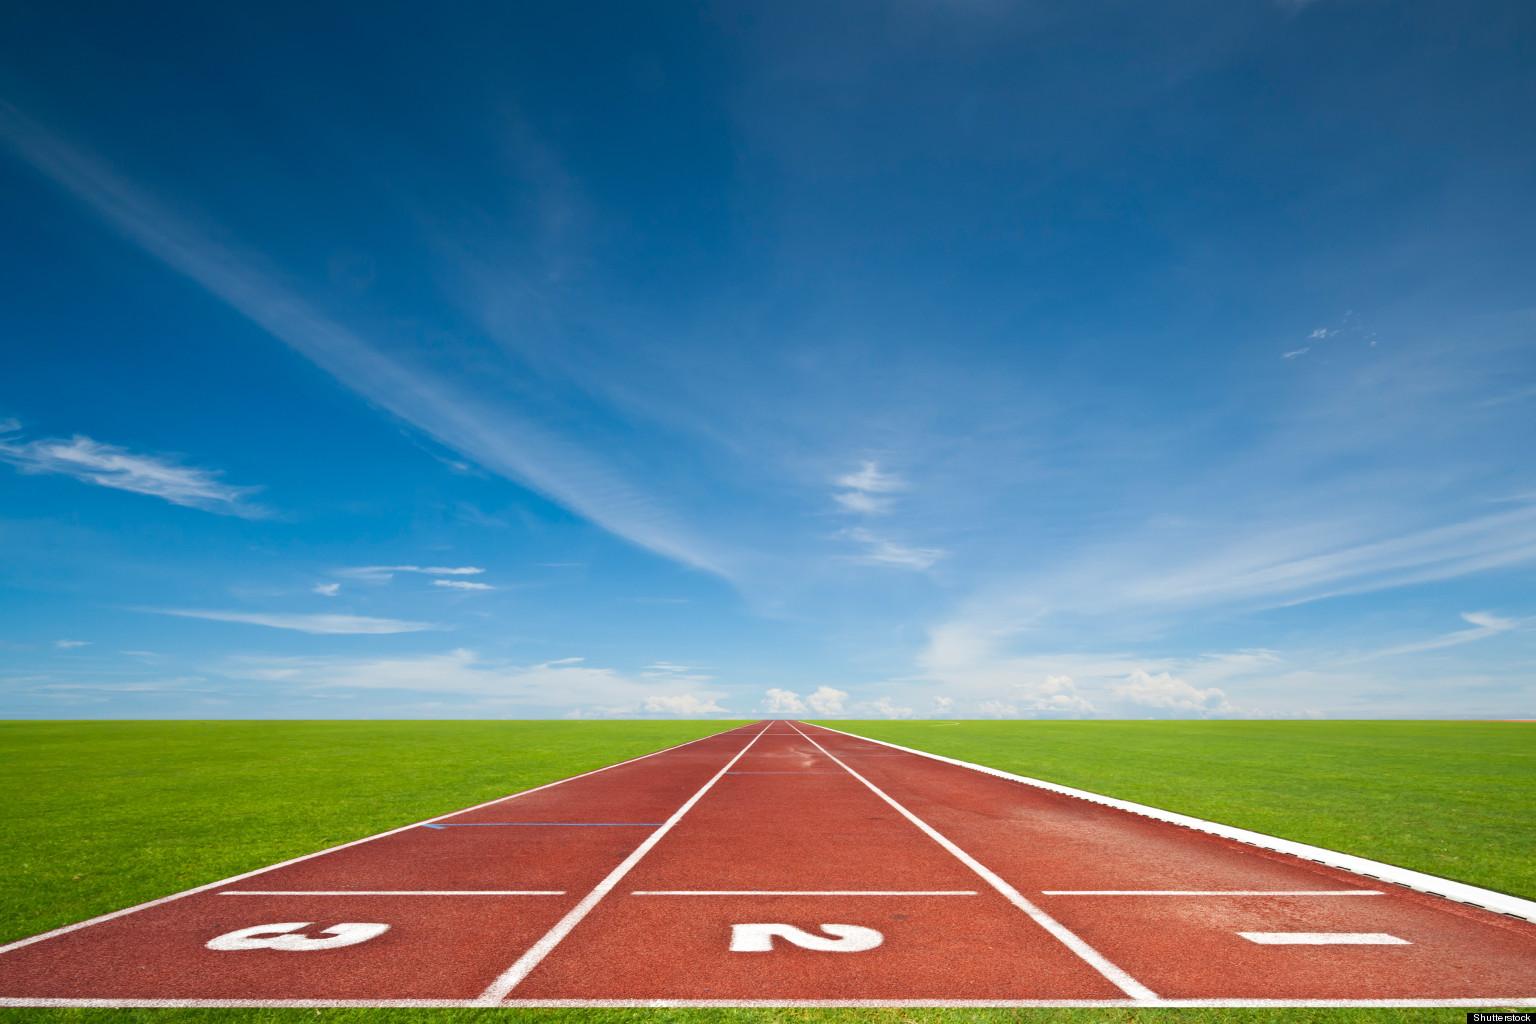 Running track background